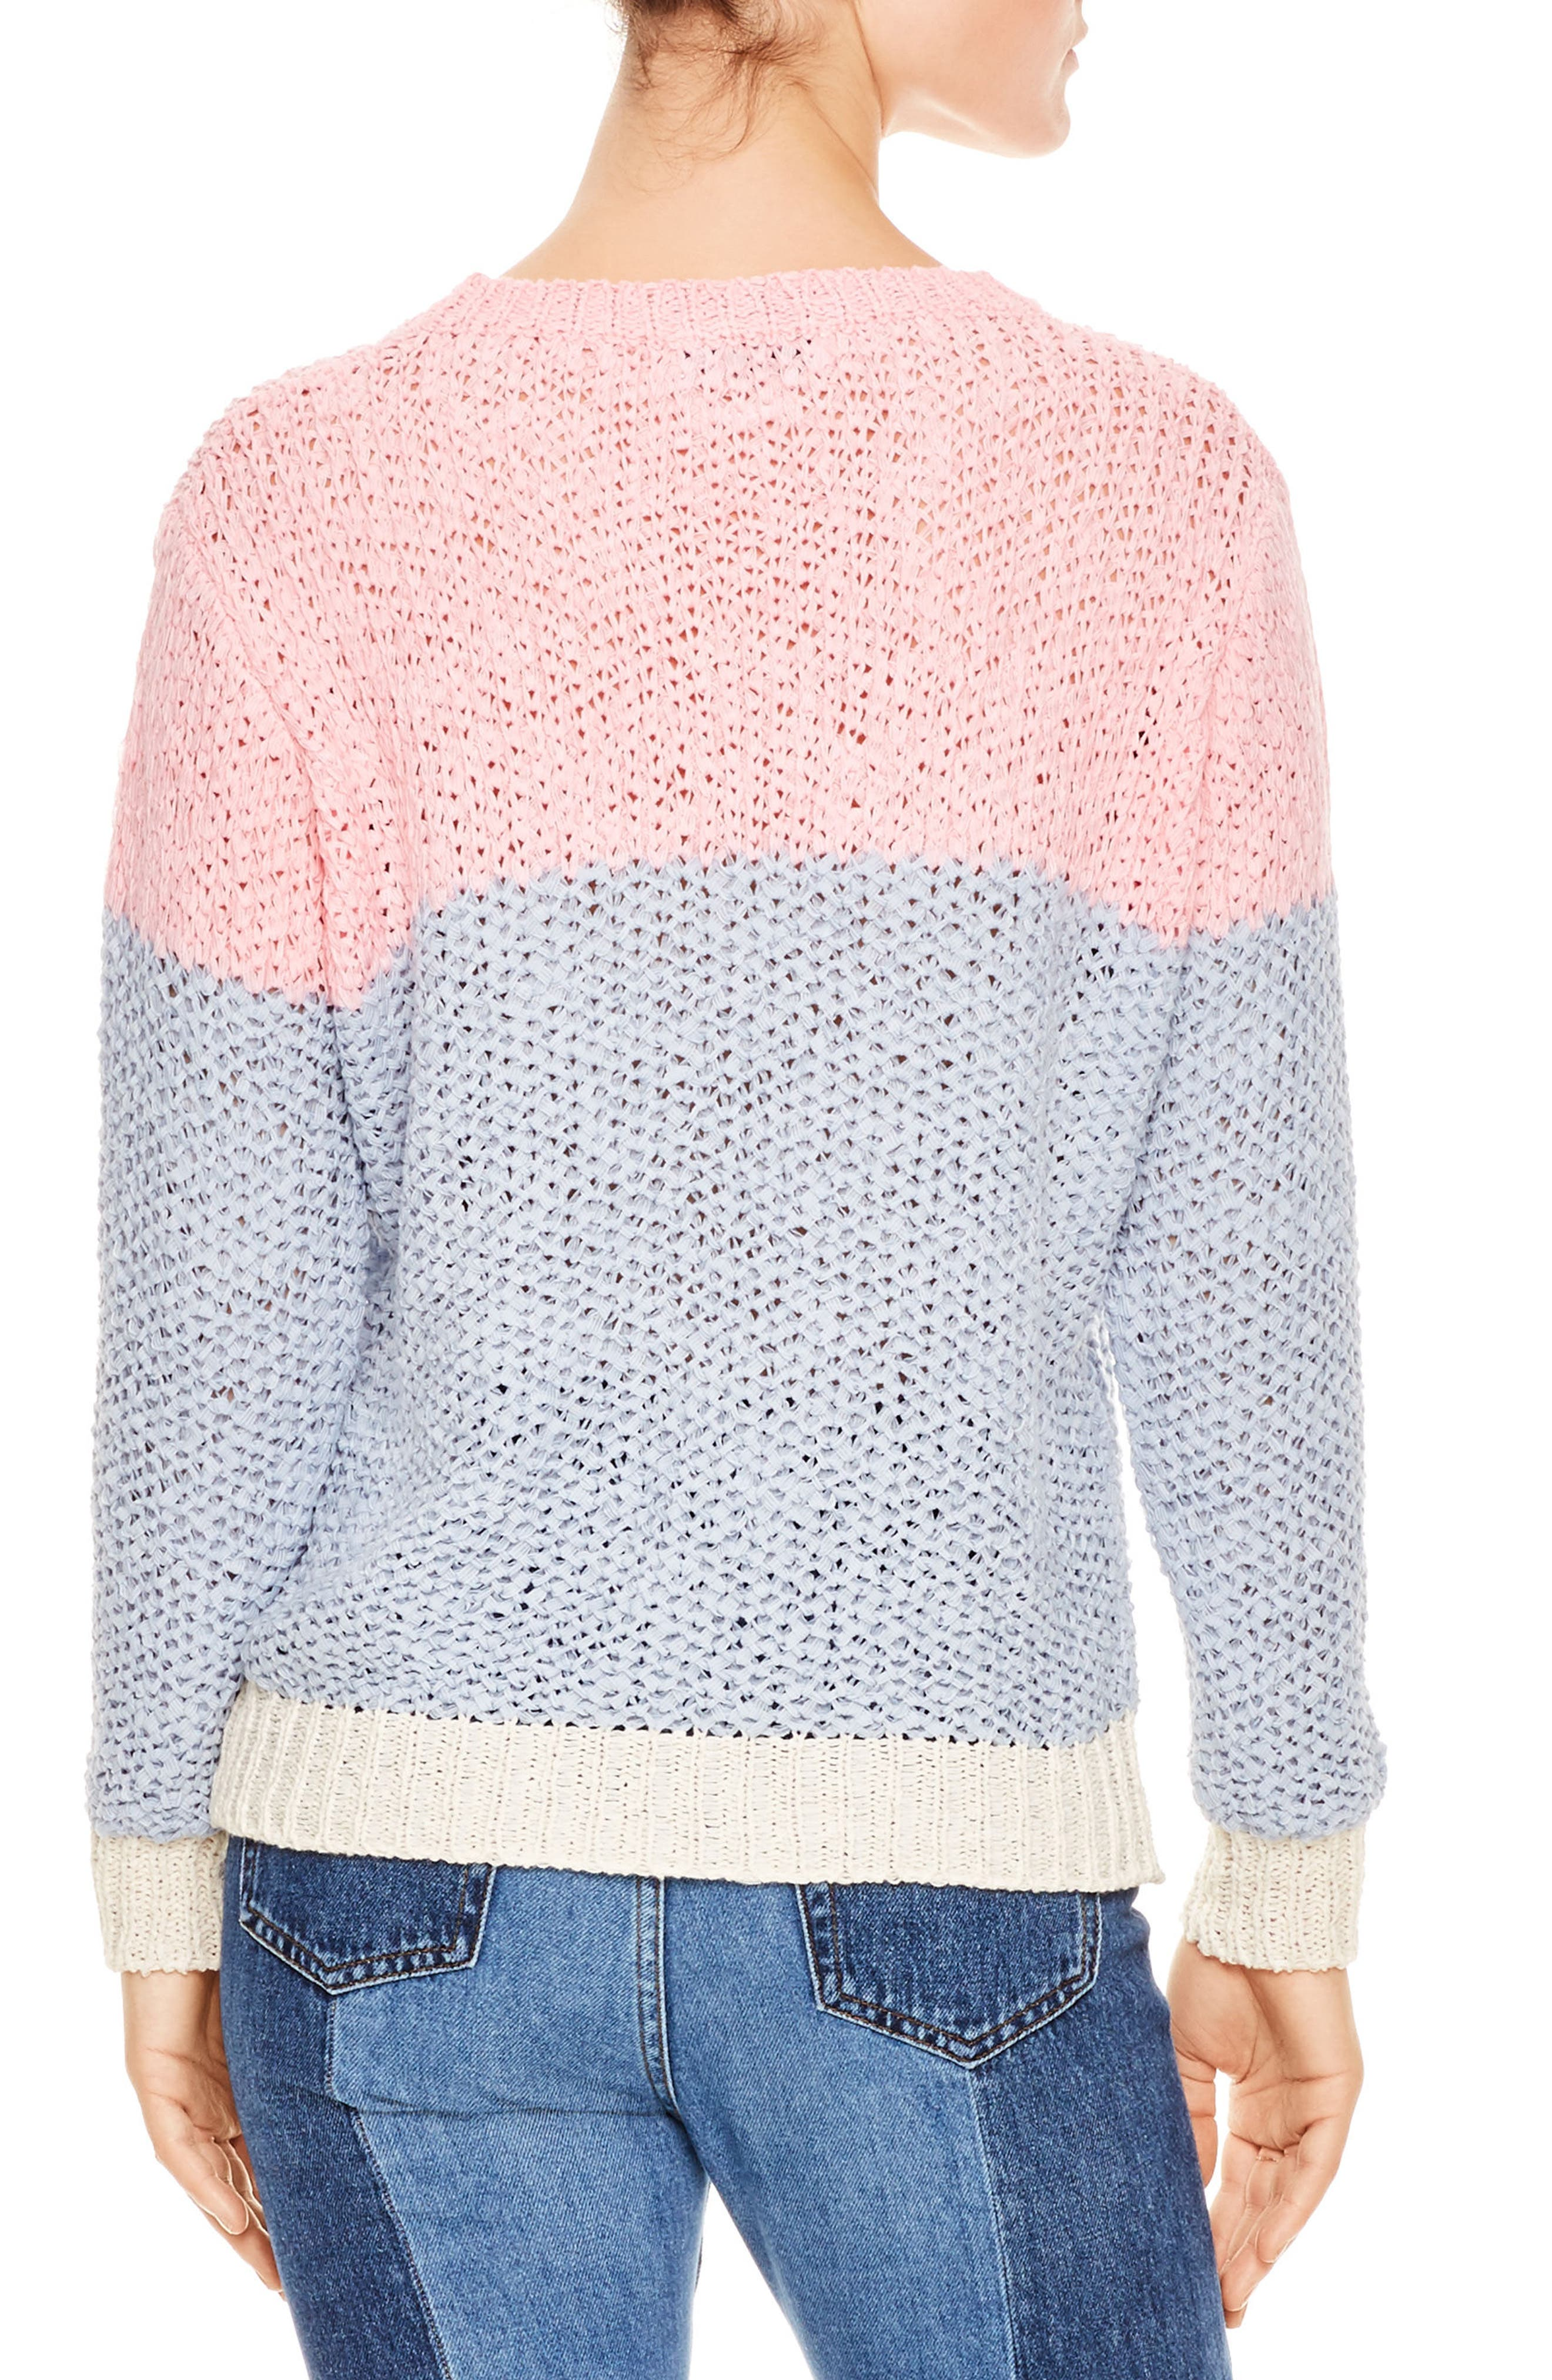 Malabar Colorblock Knit Sweater,                             Alternate thumbnail 2, color,                             650